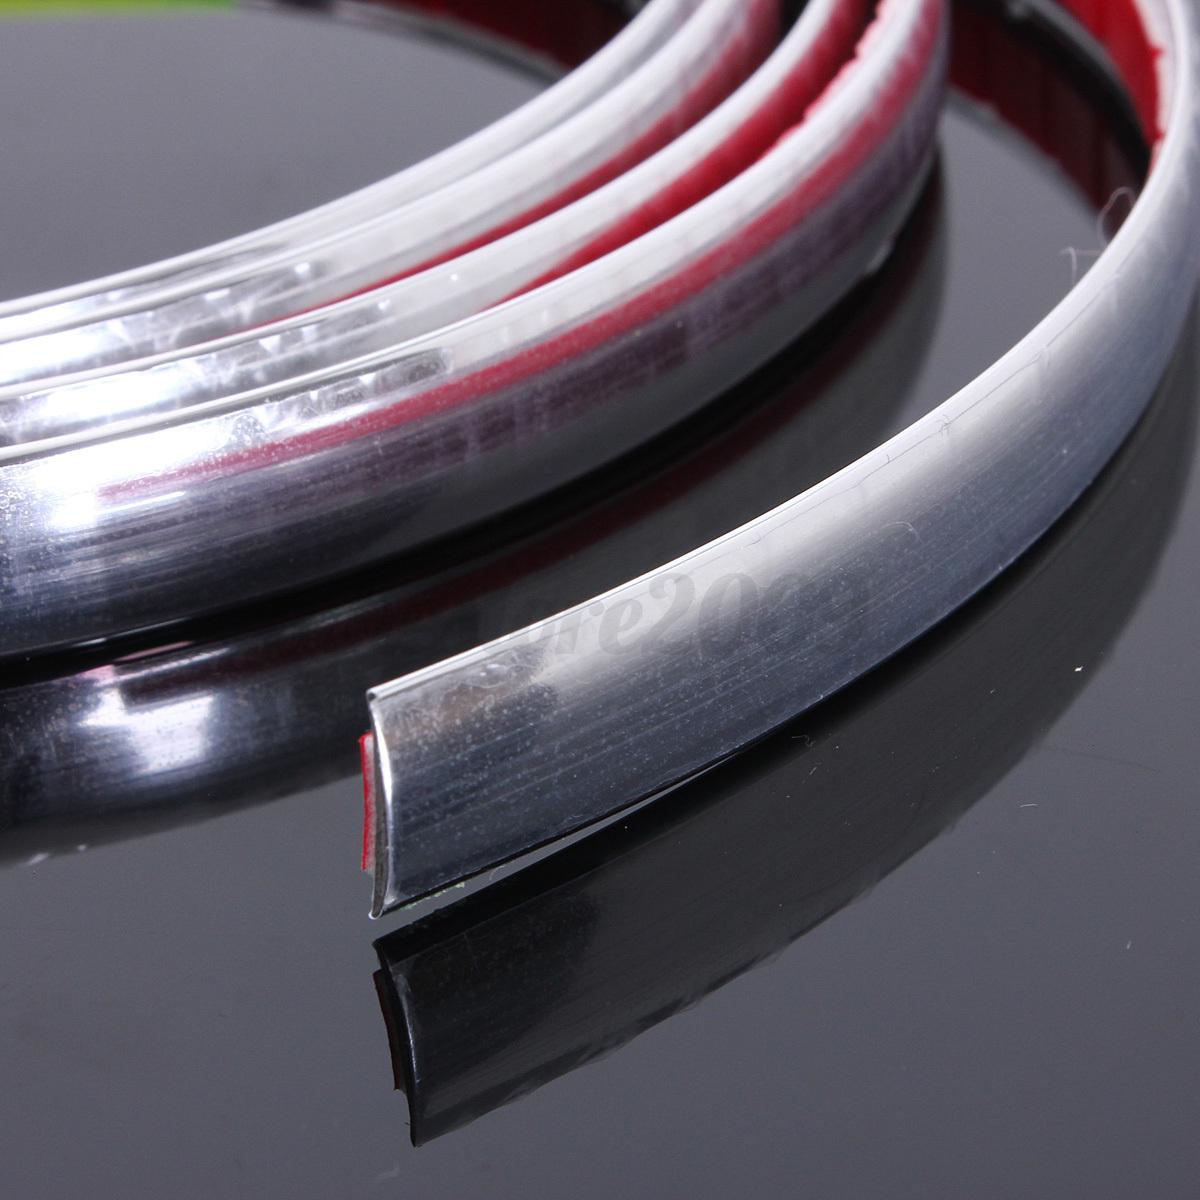 12mm 2m carstyling moulding strip trim self adhesive crashguard protector strip ebay. Black Bedroom Furniture Sets. Home Design Ideas